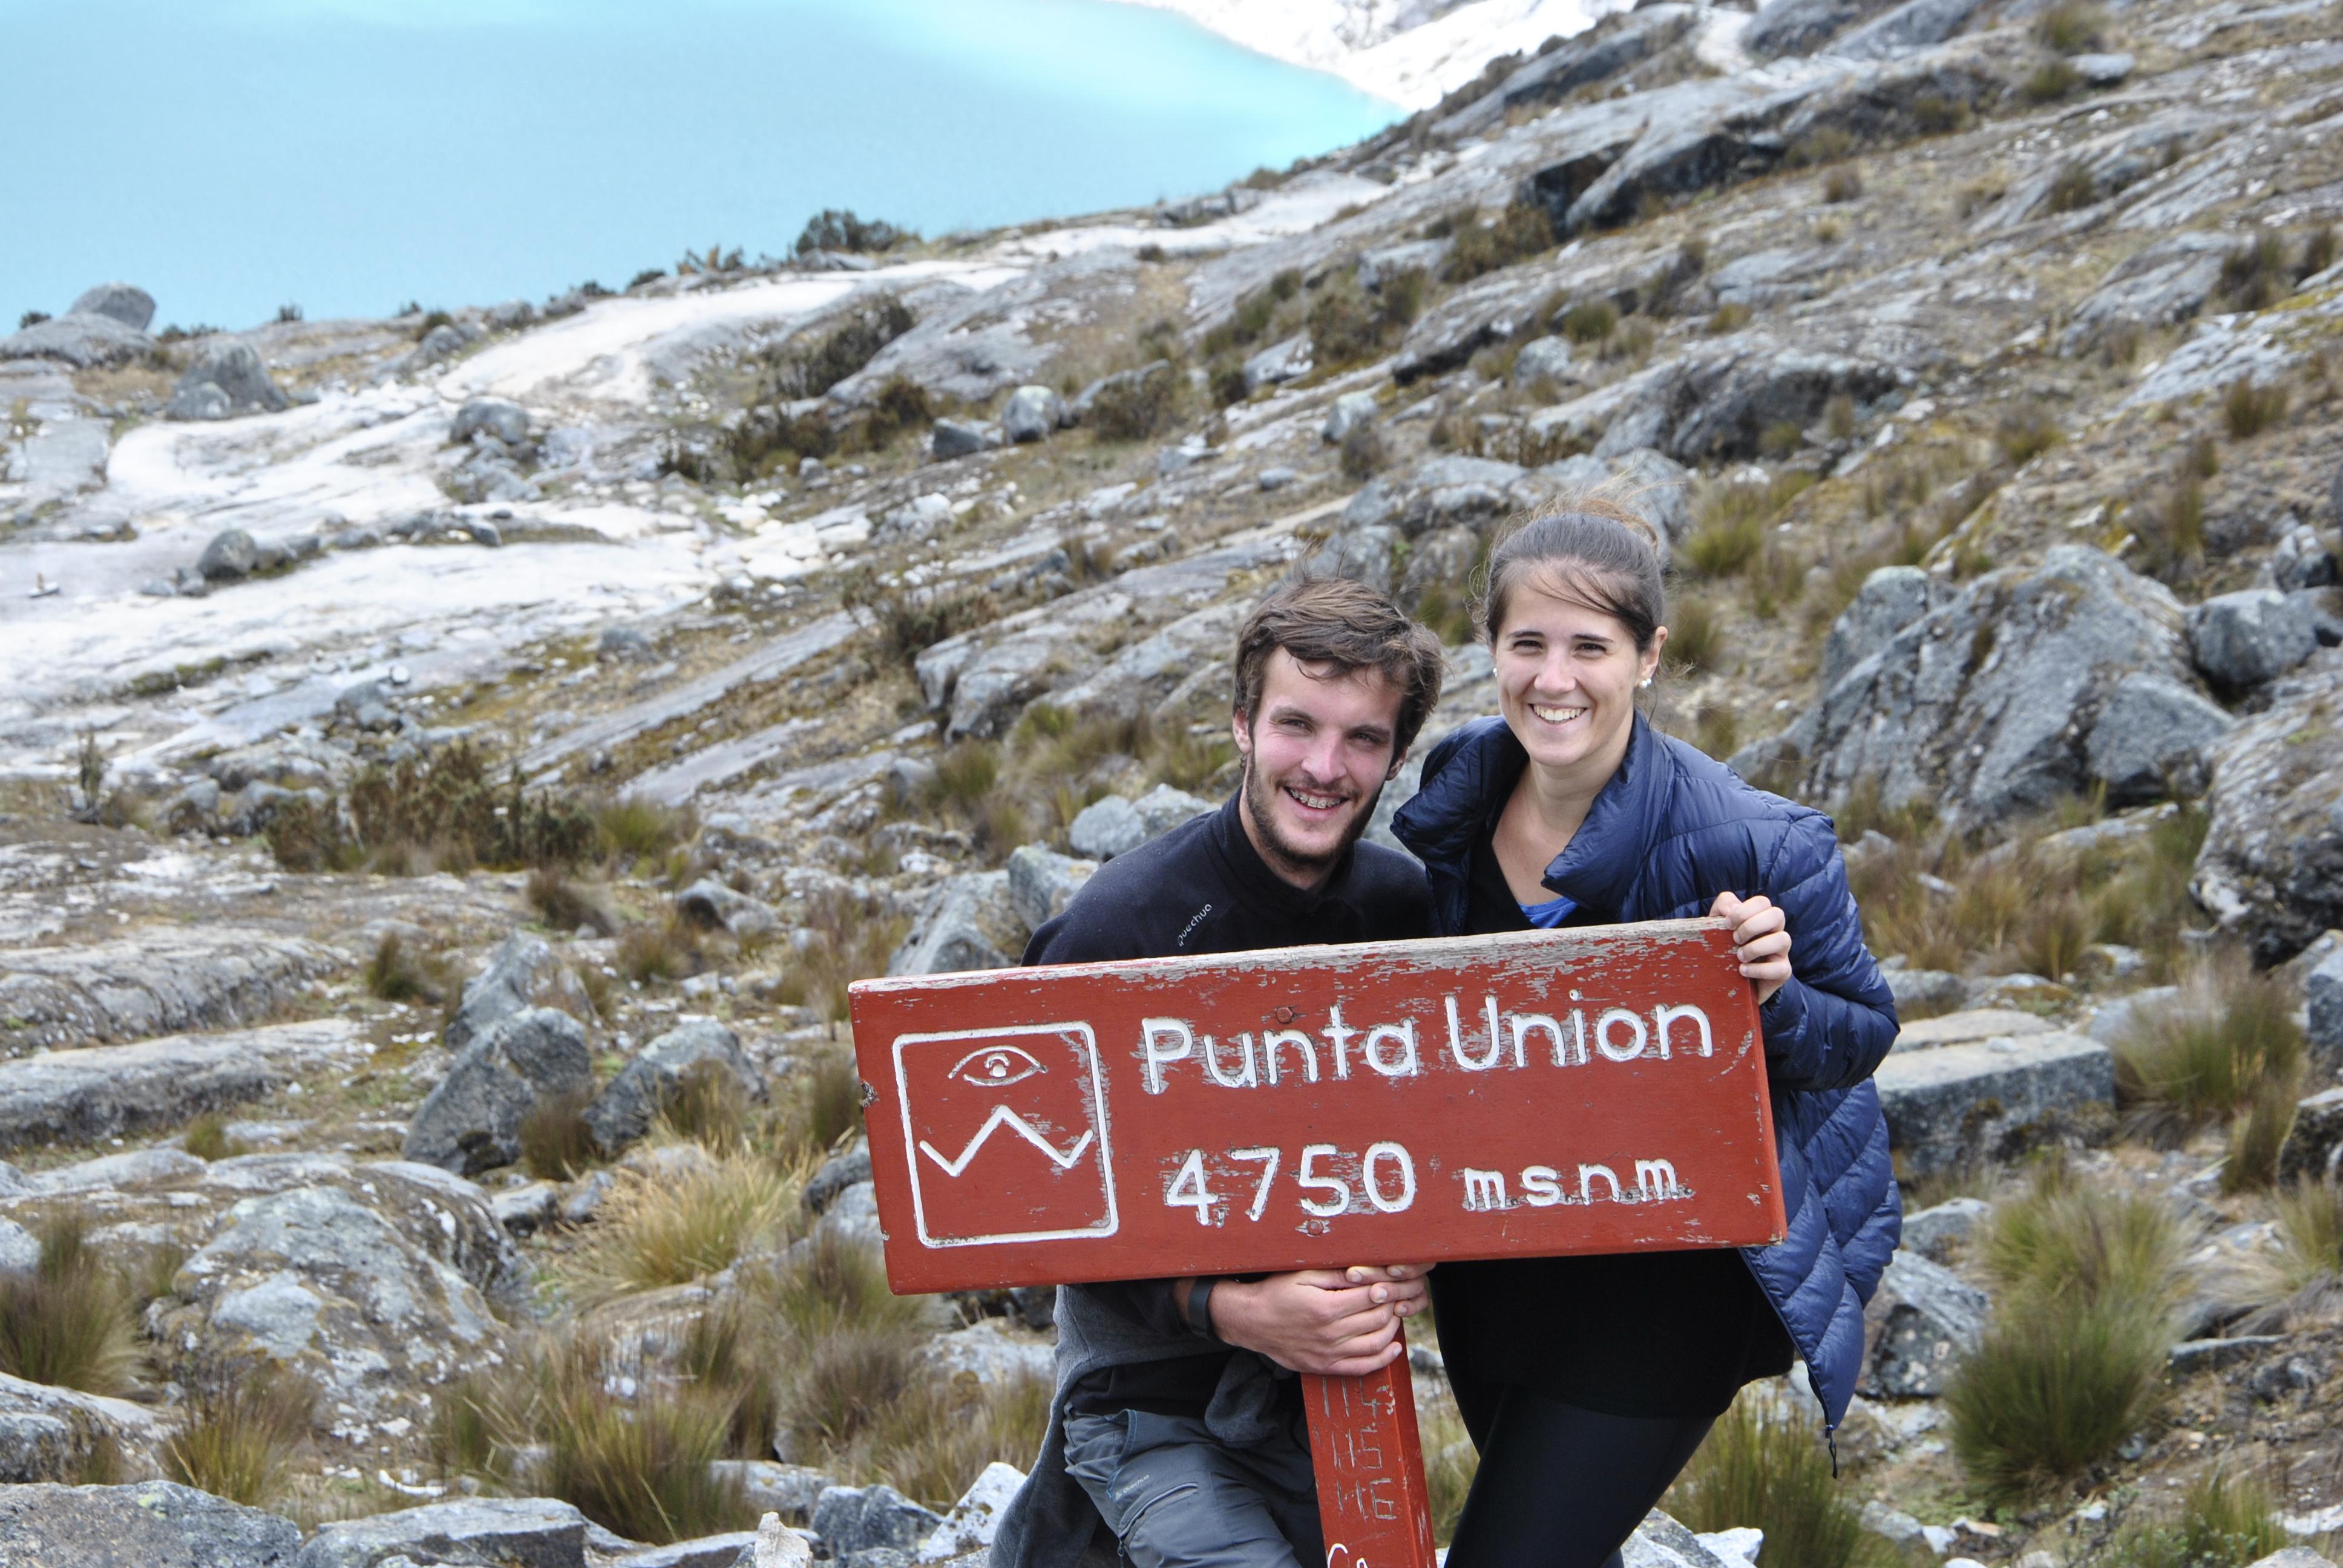 Punta, Union, Trek de Santa Cruz, Cordillère Blanche, Pérou